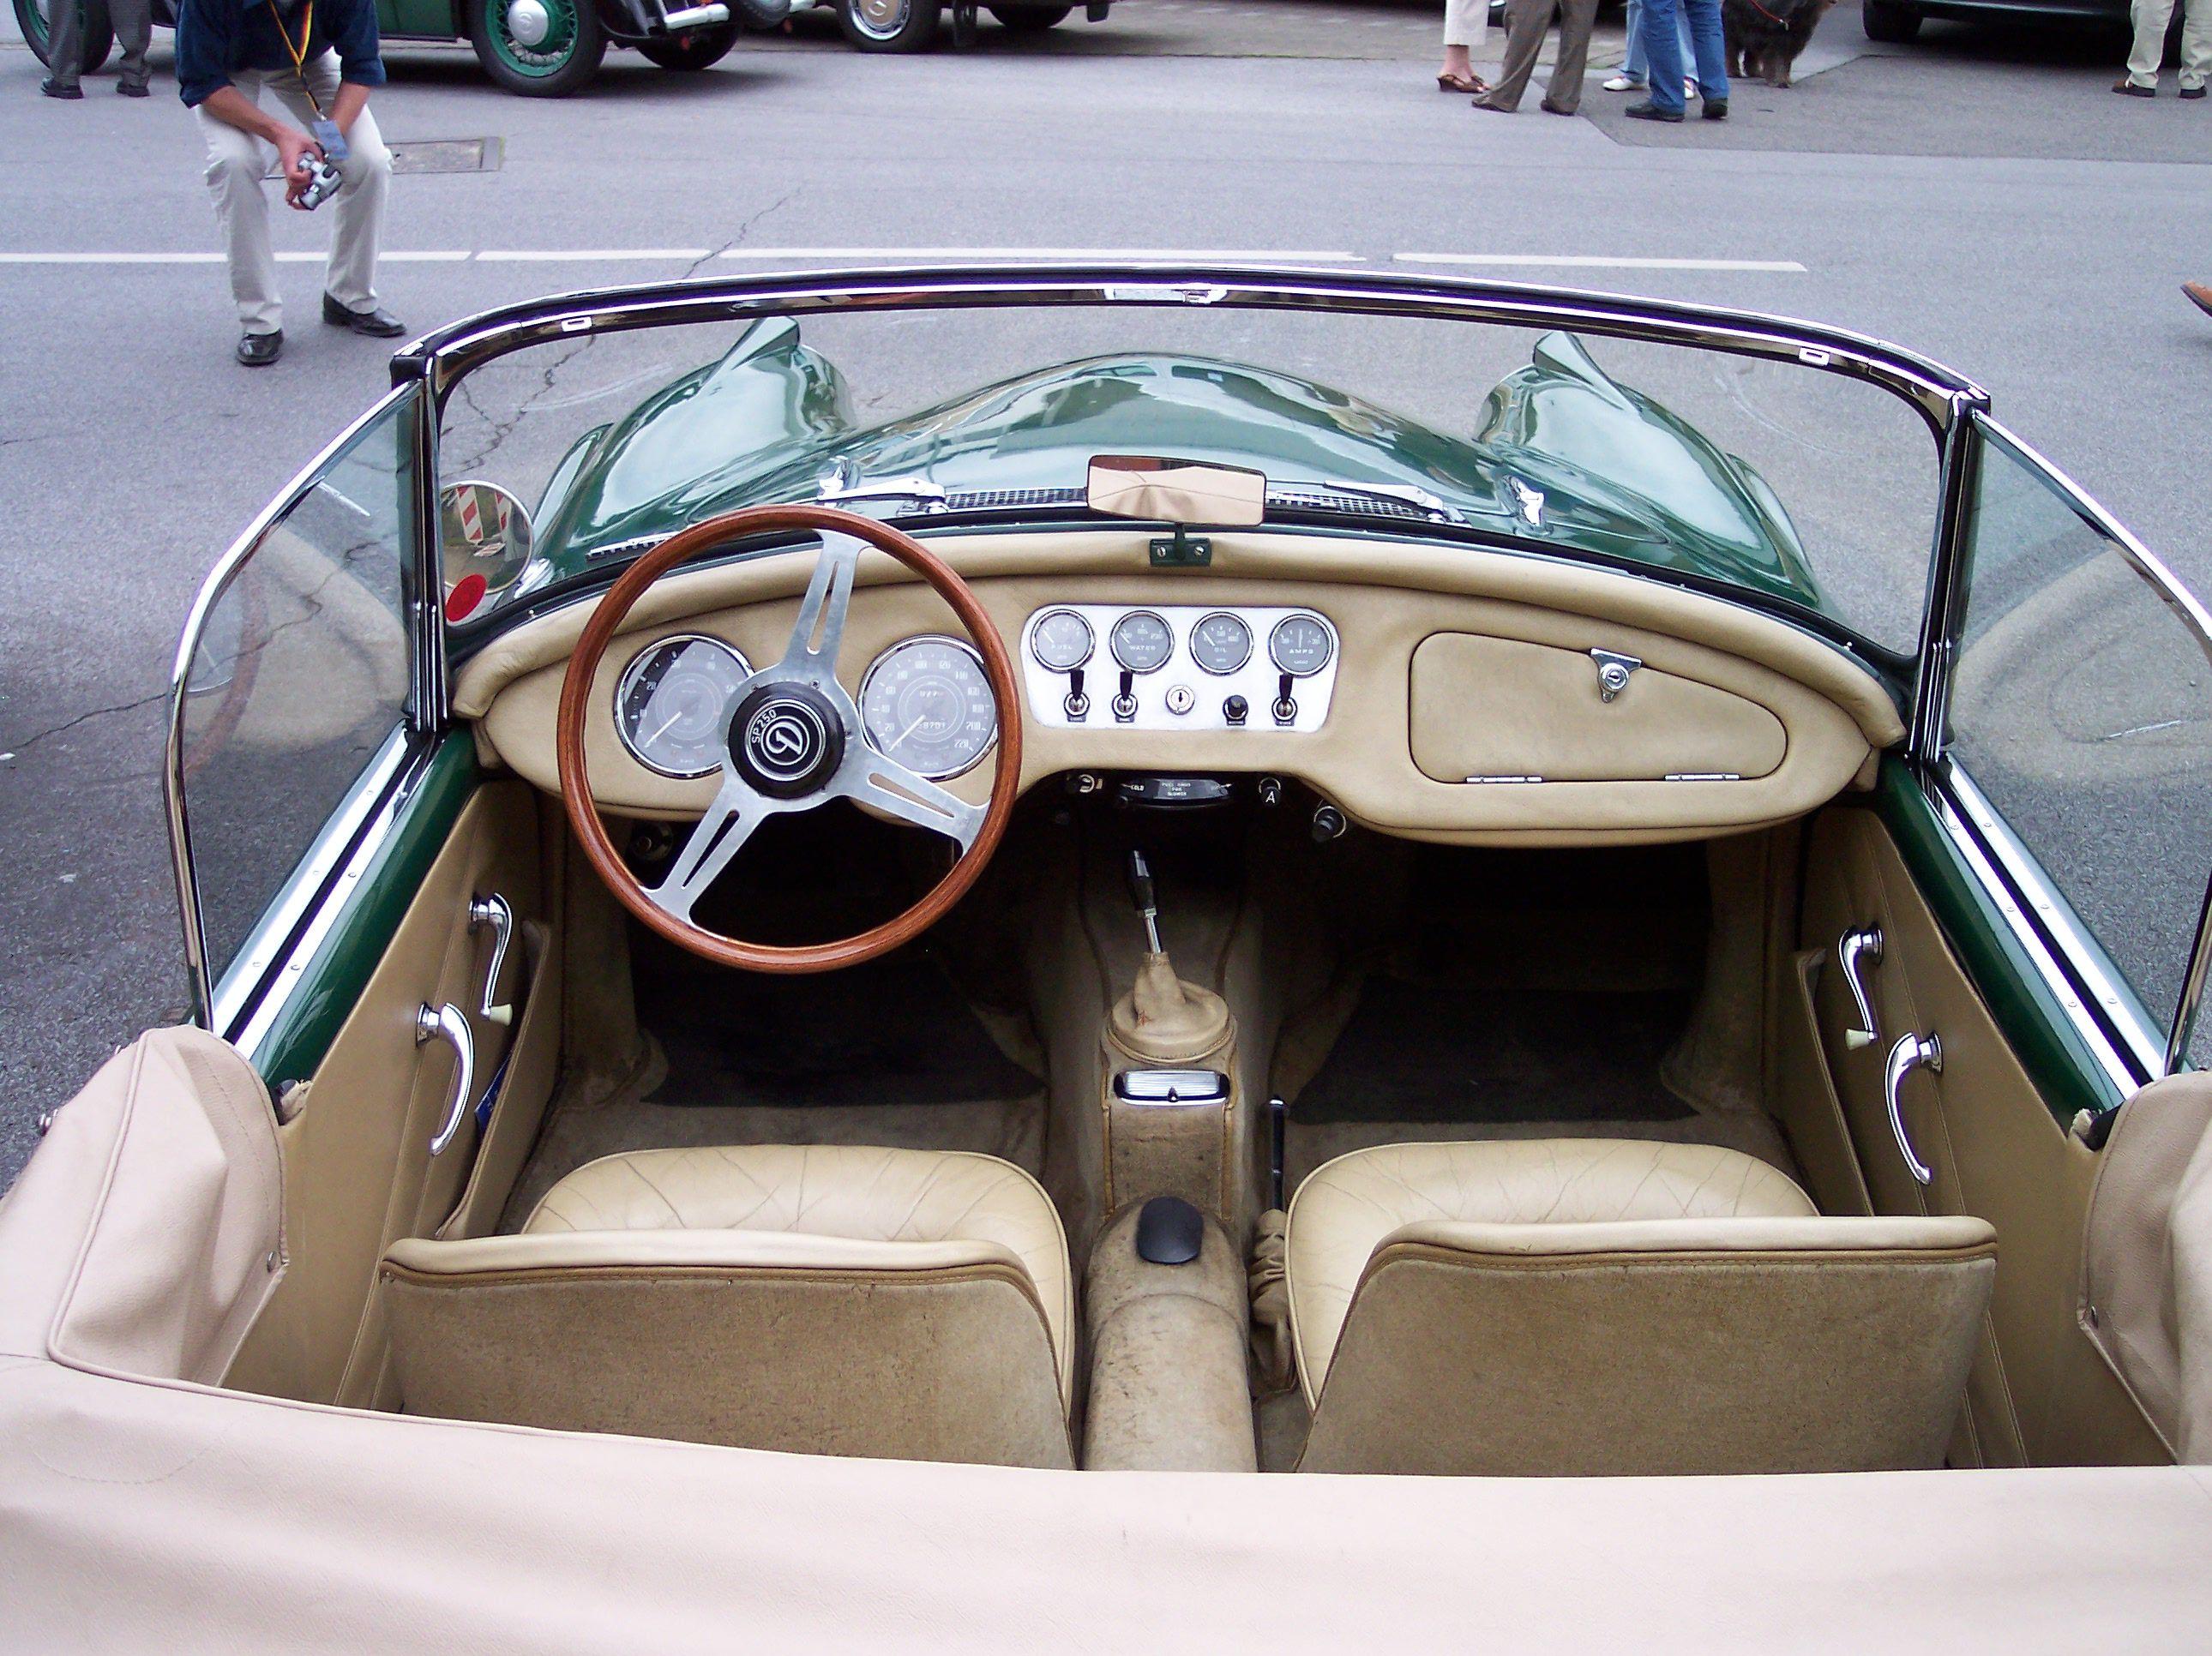 Snap Daimler Sp250 Wikipedia Photos On Pinterest Wiring Diagram Sports Car The Free Encyclopediahtml Autos Post